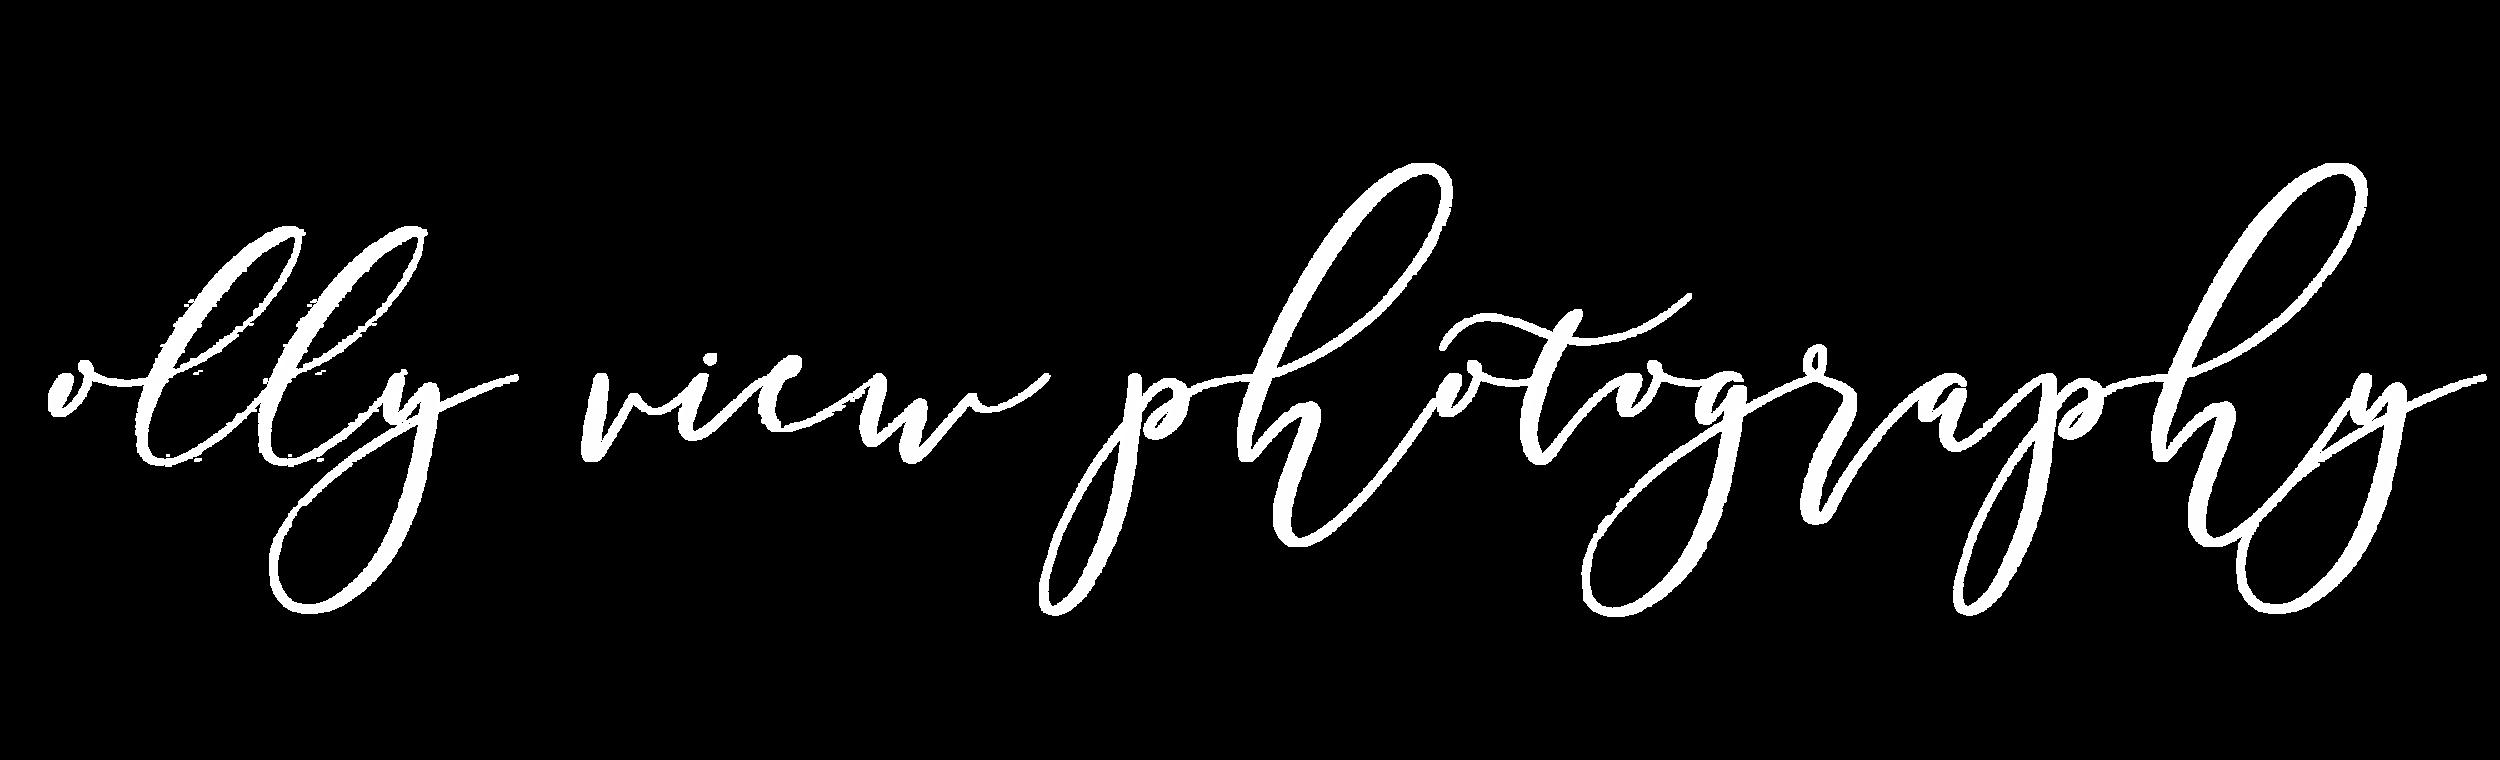 logo png white.png